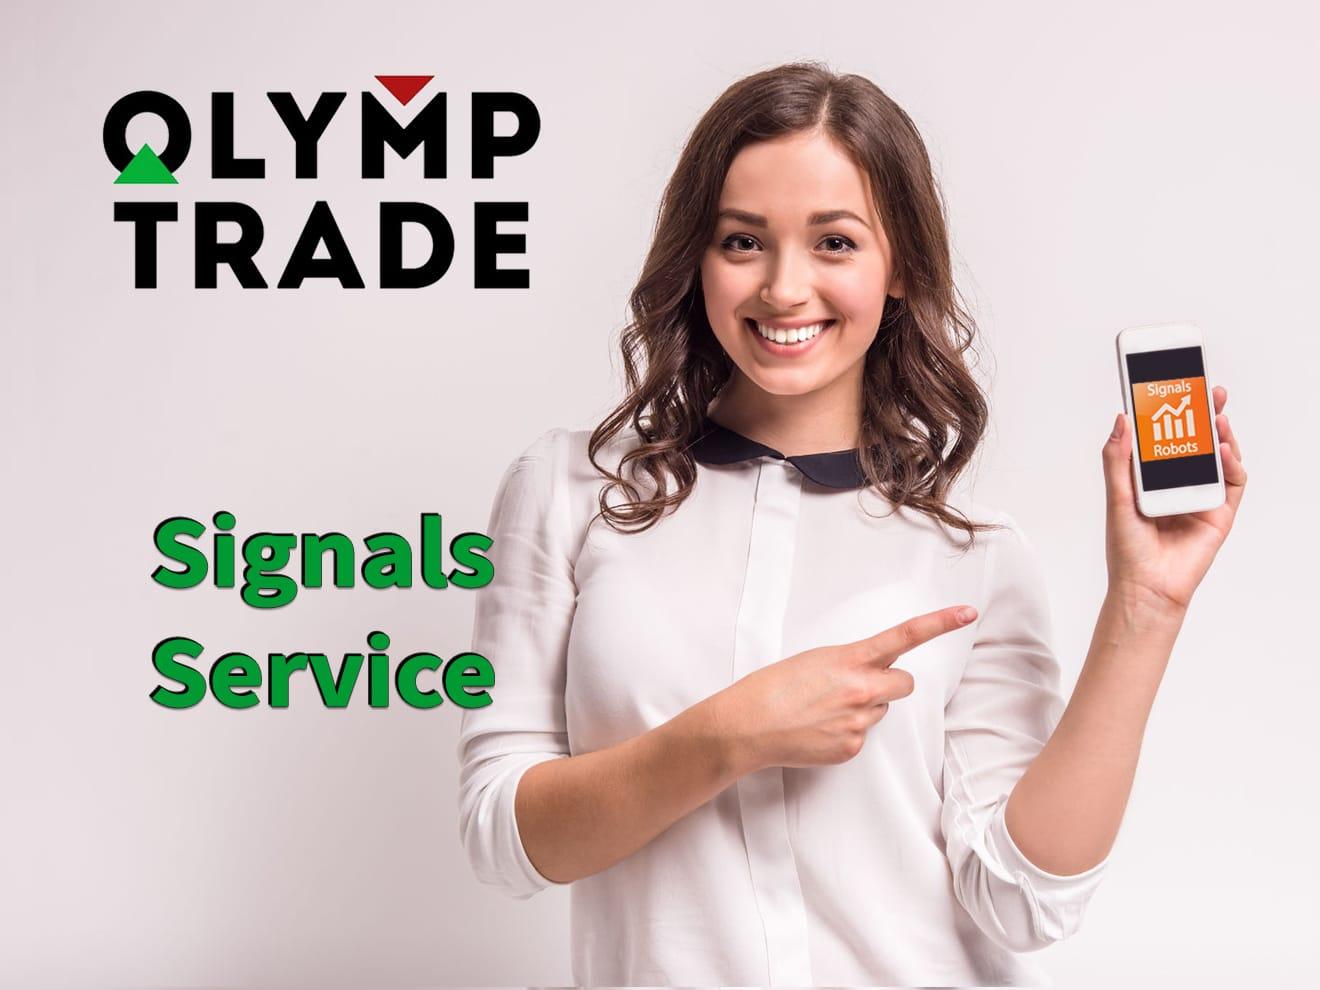 olymp trade binary options signals